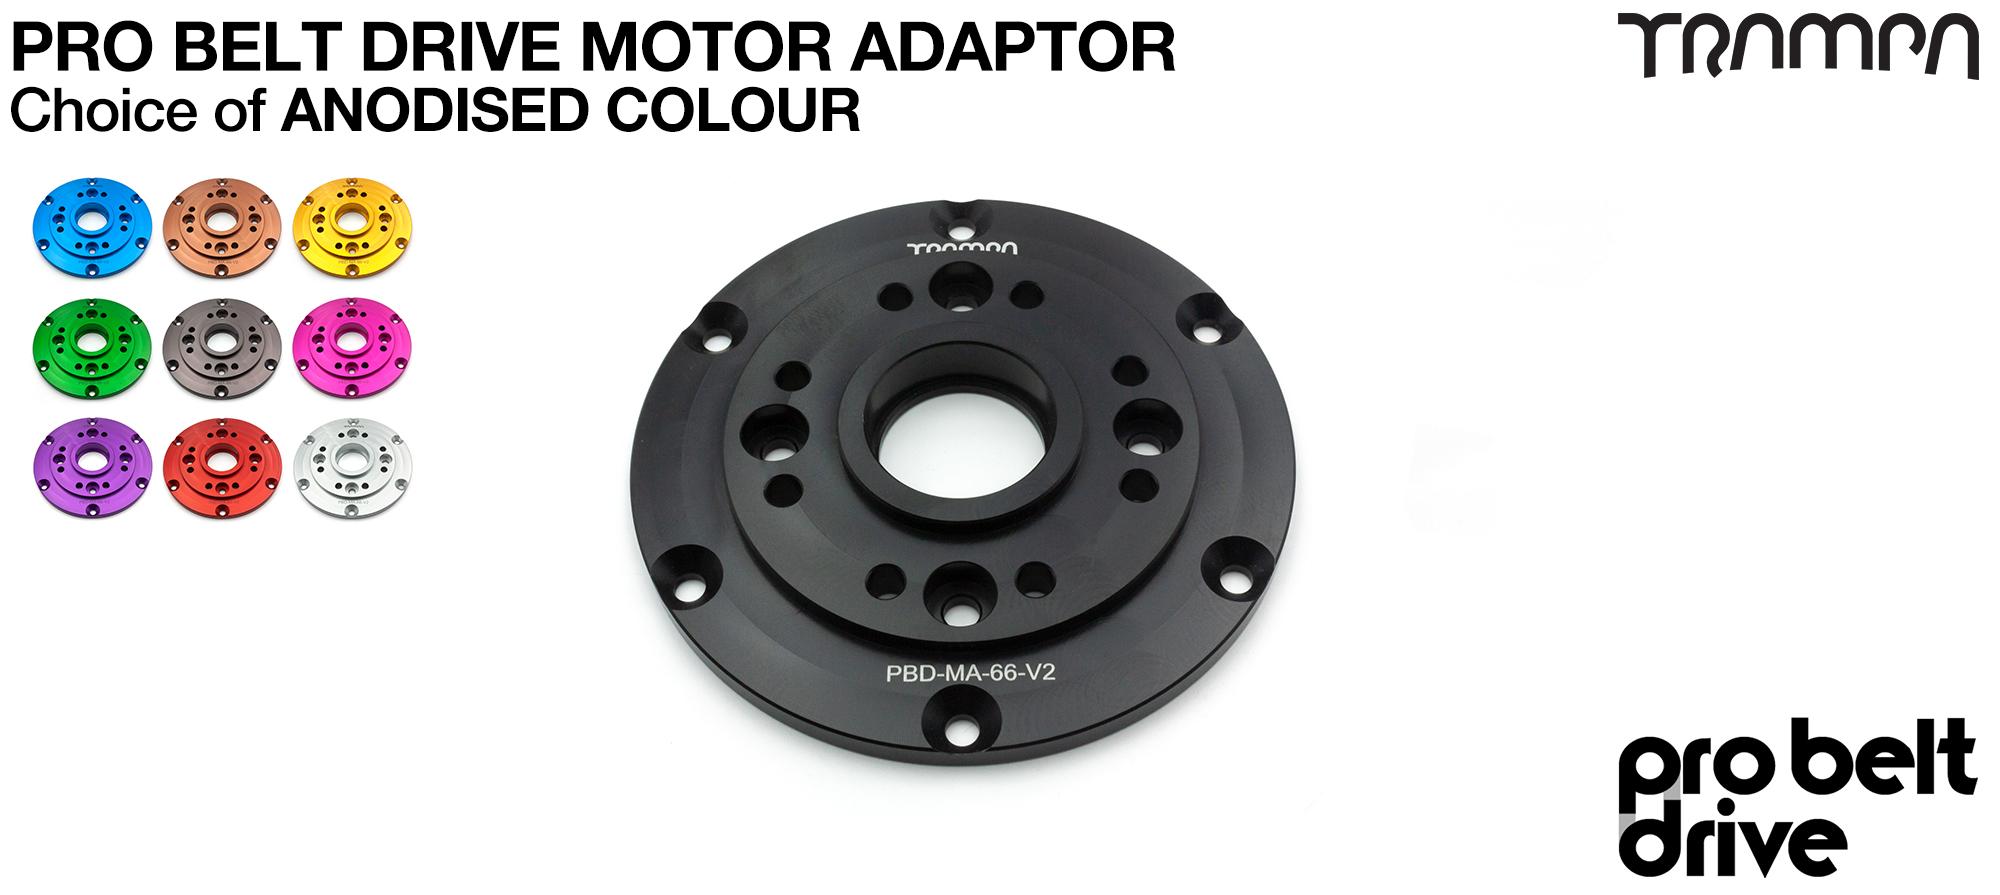 20mm PRO Belt MOTOR ADAPTOR